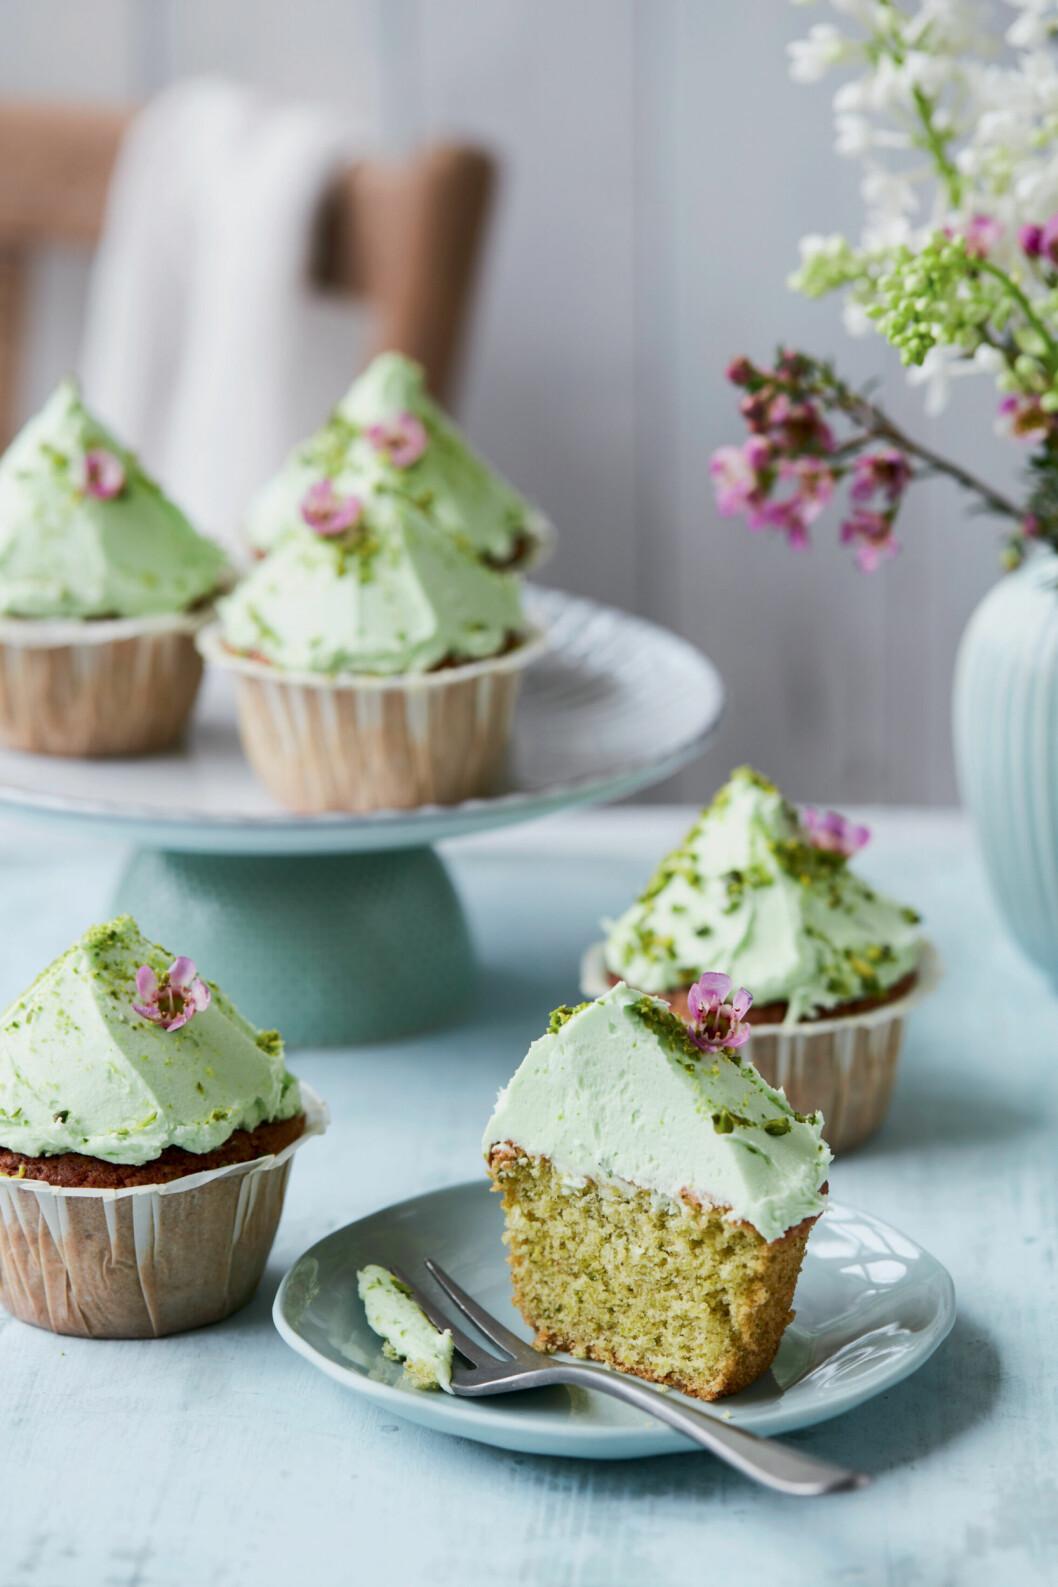 Recept på pistaschcupcakes